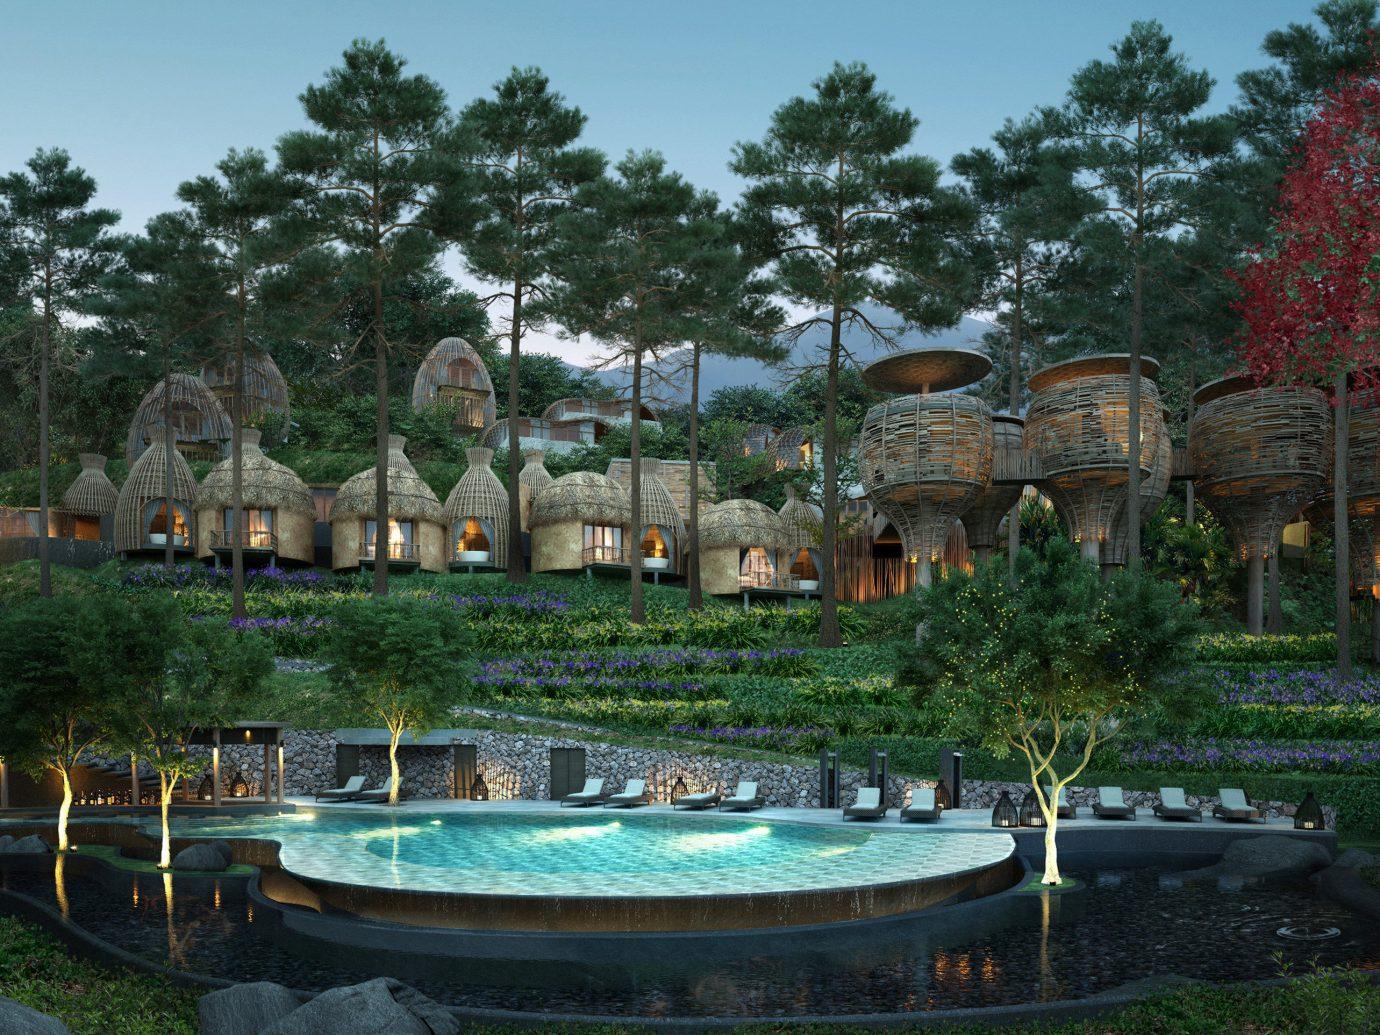 Hotels tree outdoor sky property estate swimming pool Resort backyard Garden Village mansion waterway several Boat